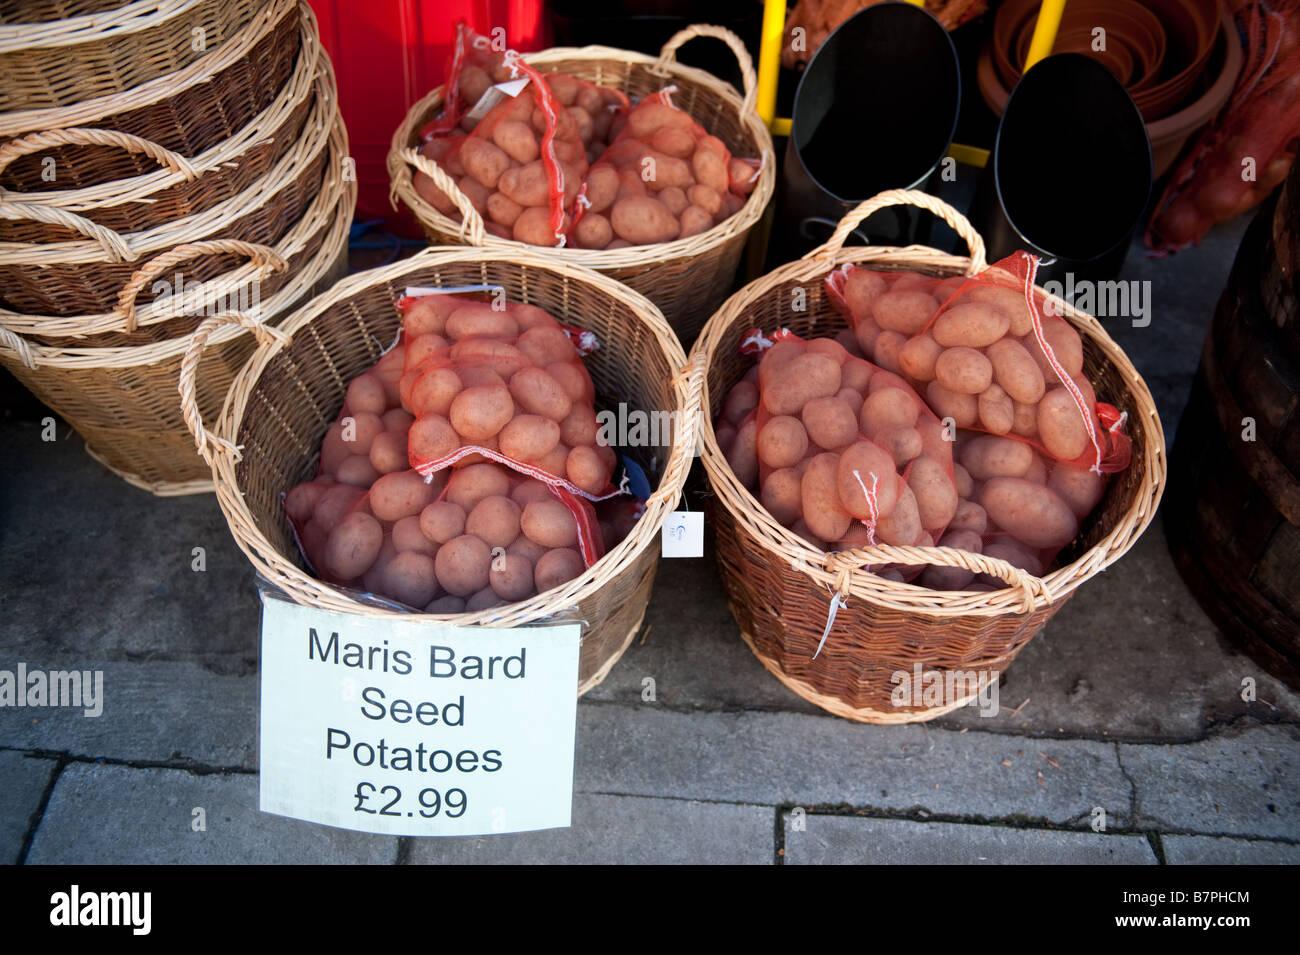 Baskets of MARIS BARD seed potatoes on sale - Stock Image